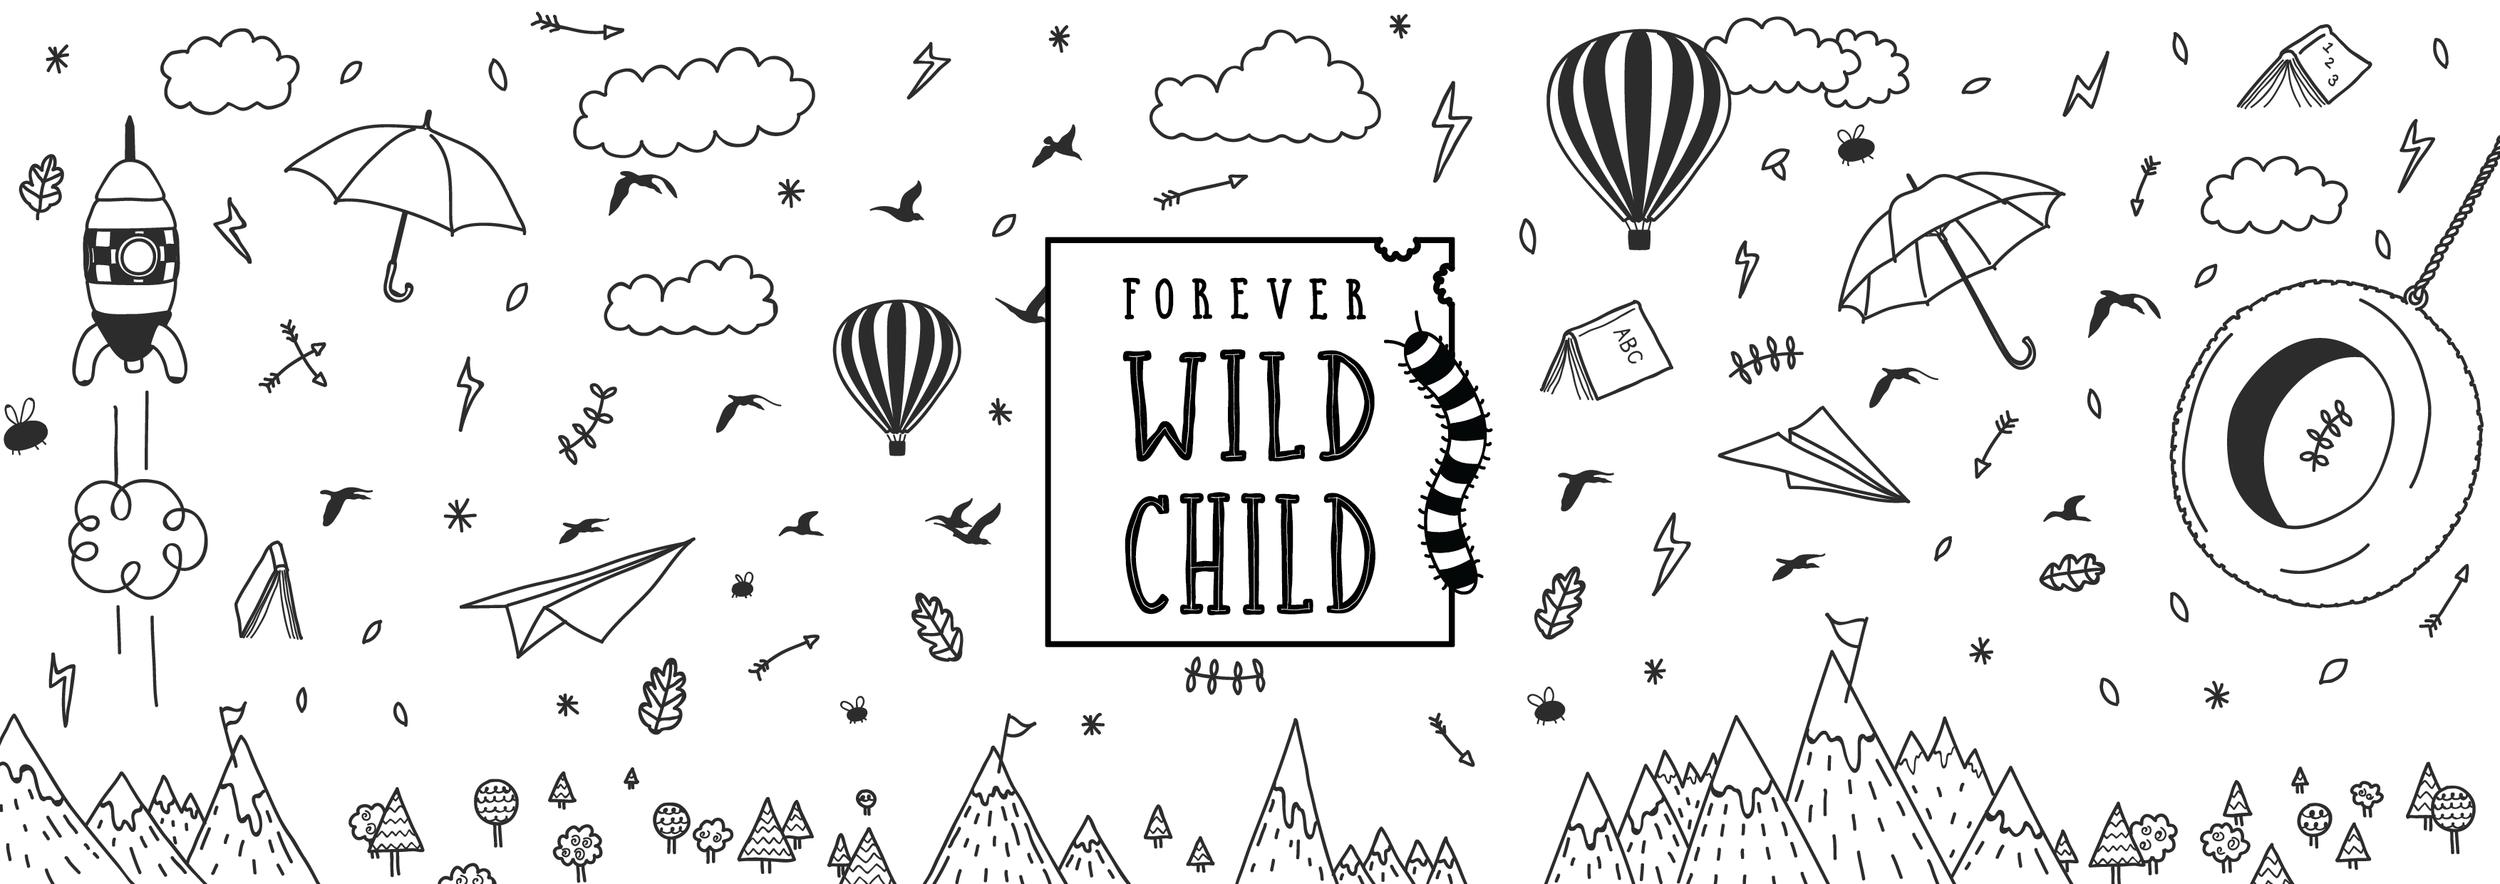 foreverwildchildbanner-01.png